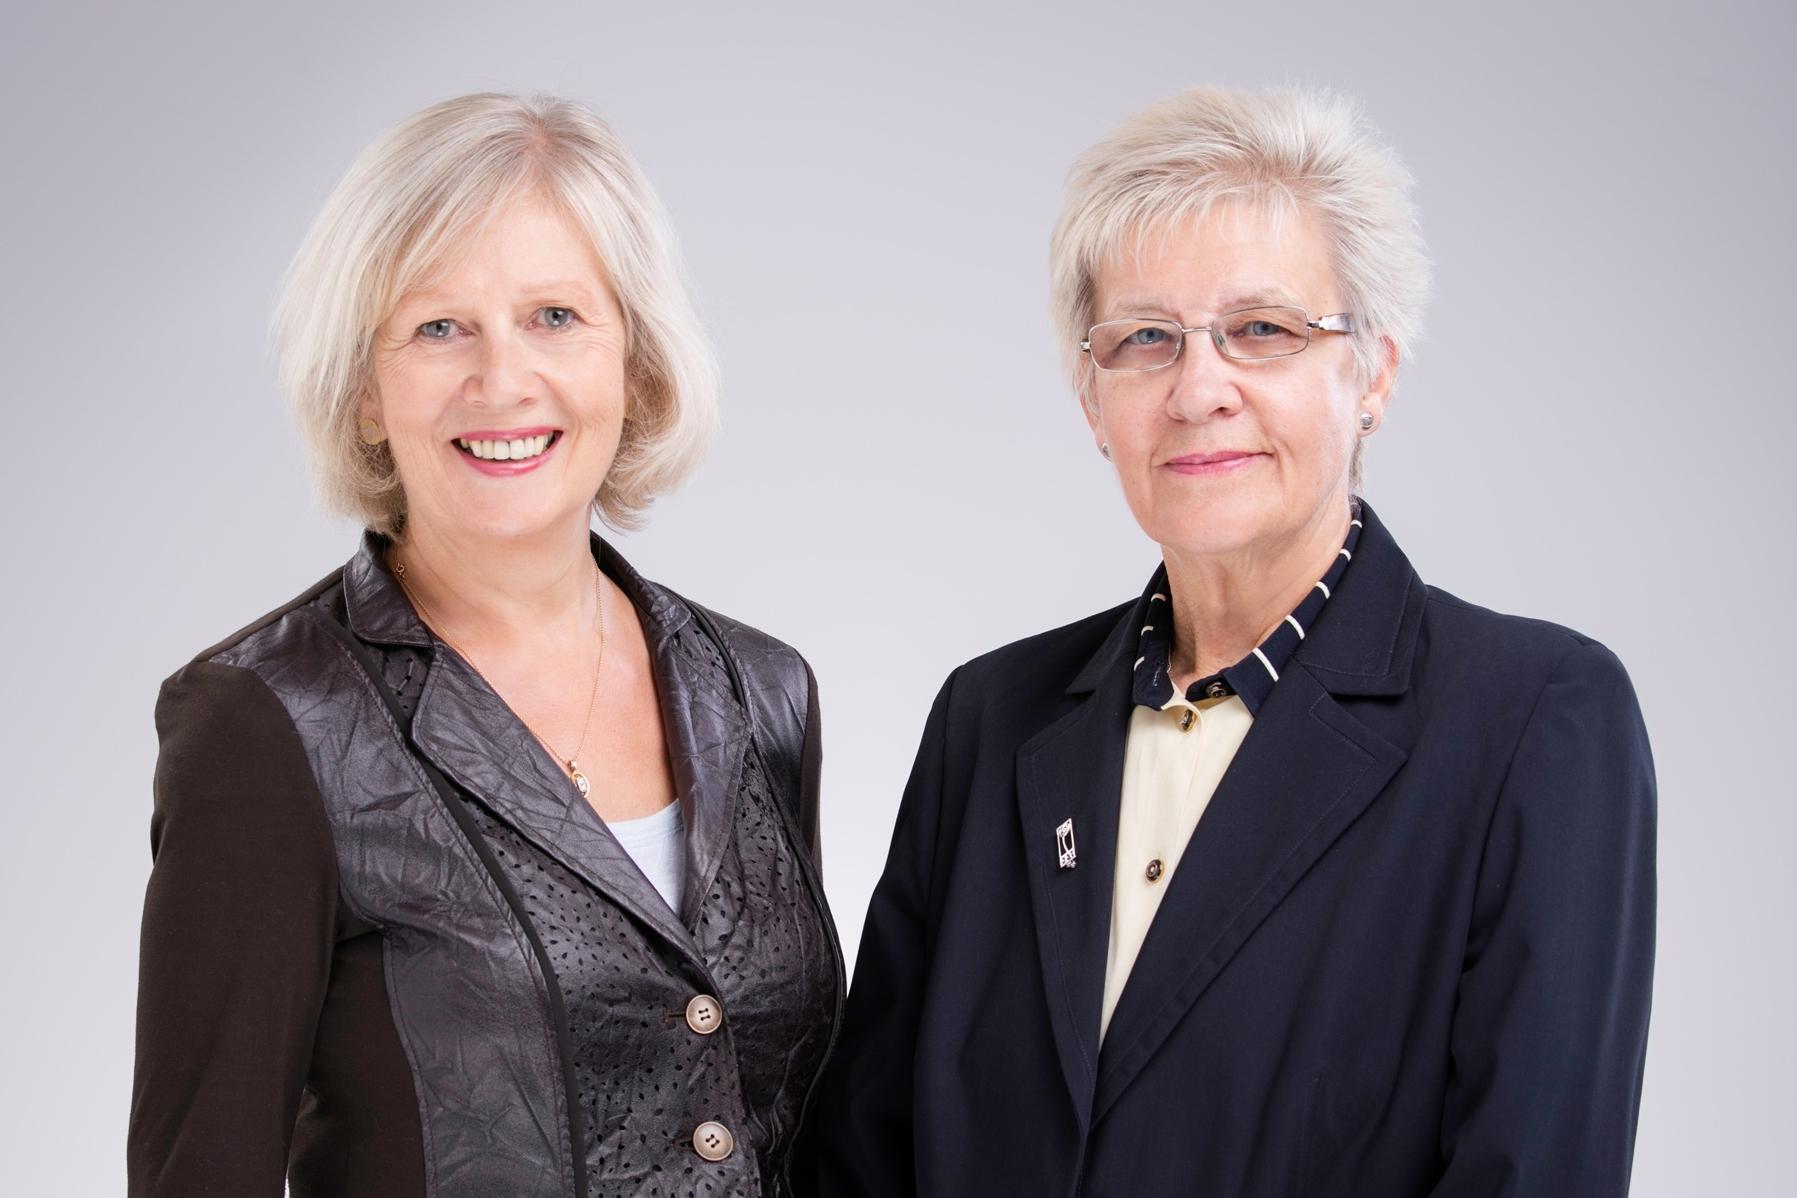 CO-FOUNDERS OF wish:  EVE WARREN & Meg maunder